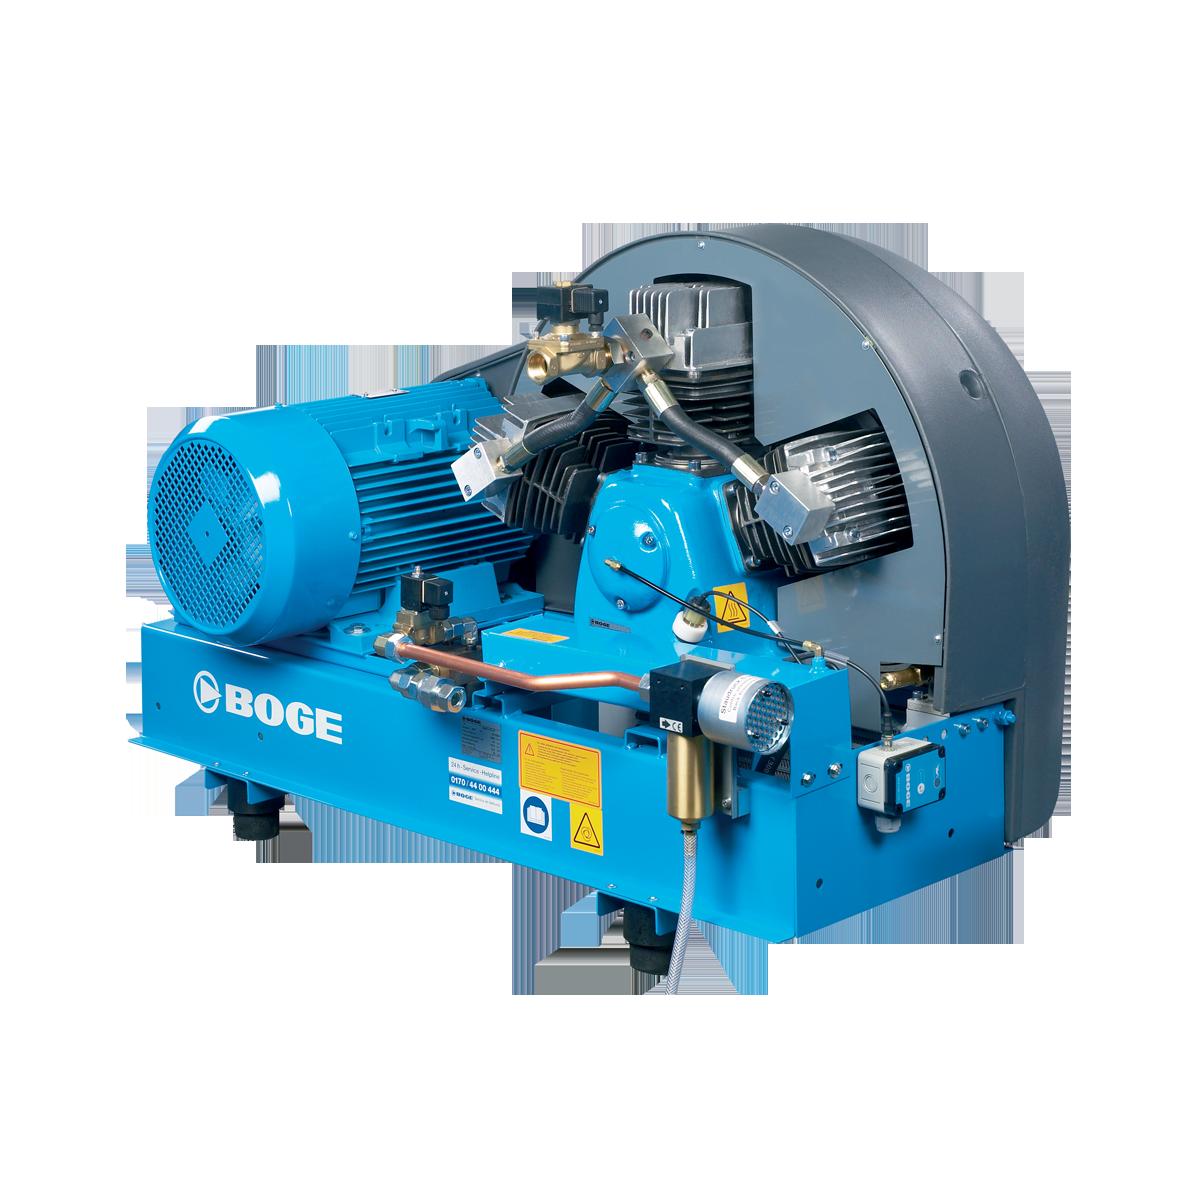 piston compressor srhv up to 18 5 kw boge compressors rh boge com Bock Compressors USA Boge Compressors S 271